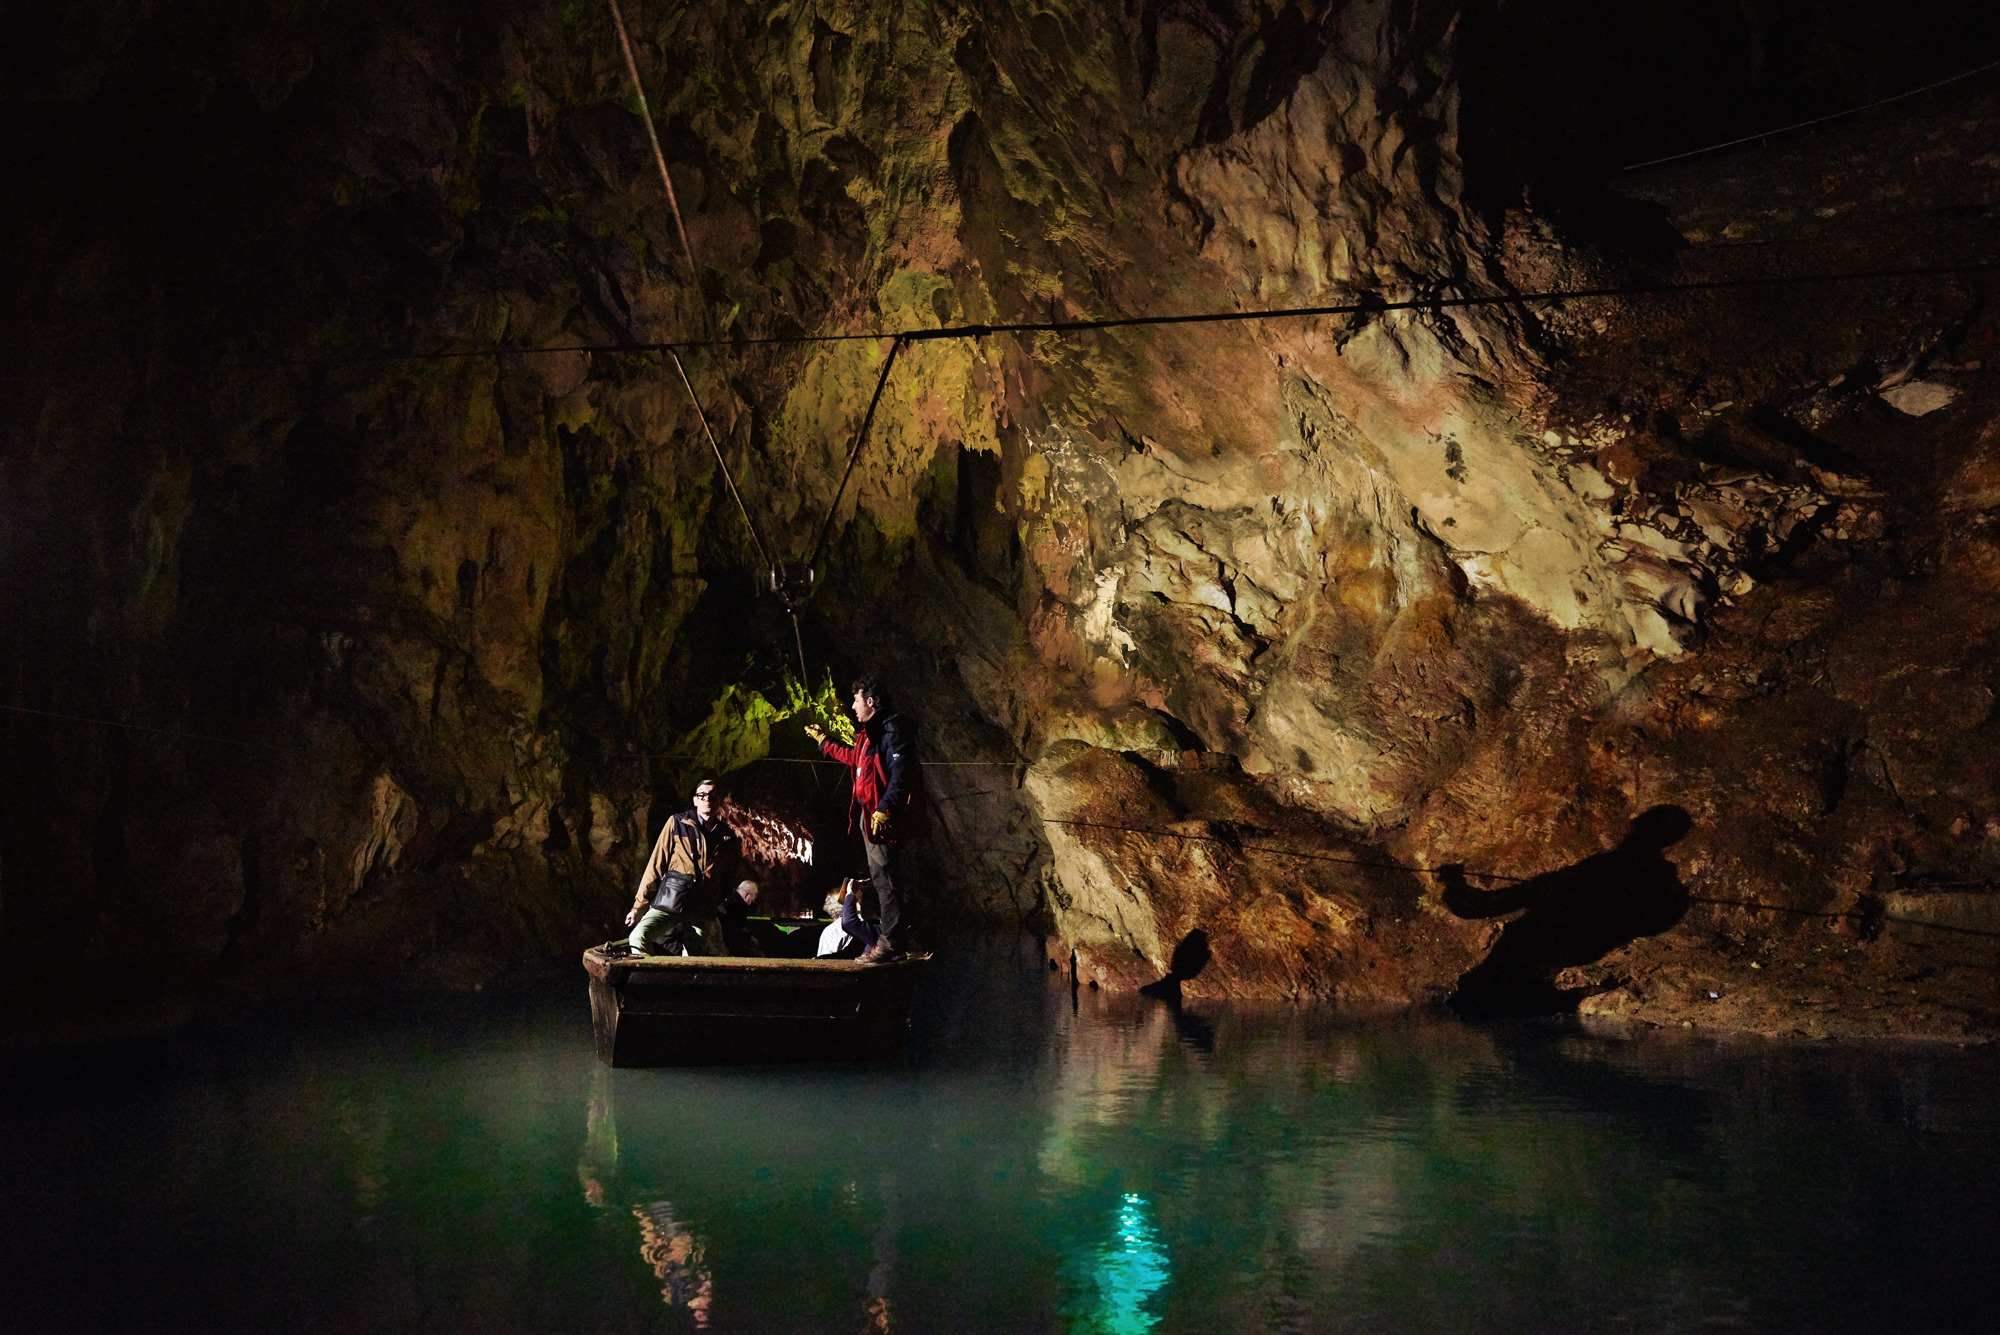 Grotte di Pertosa Campania